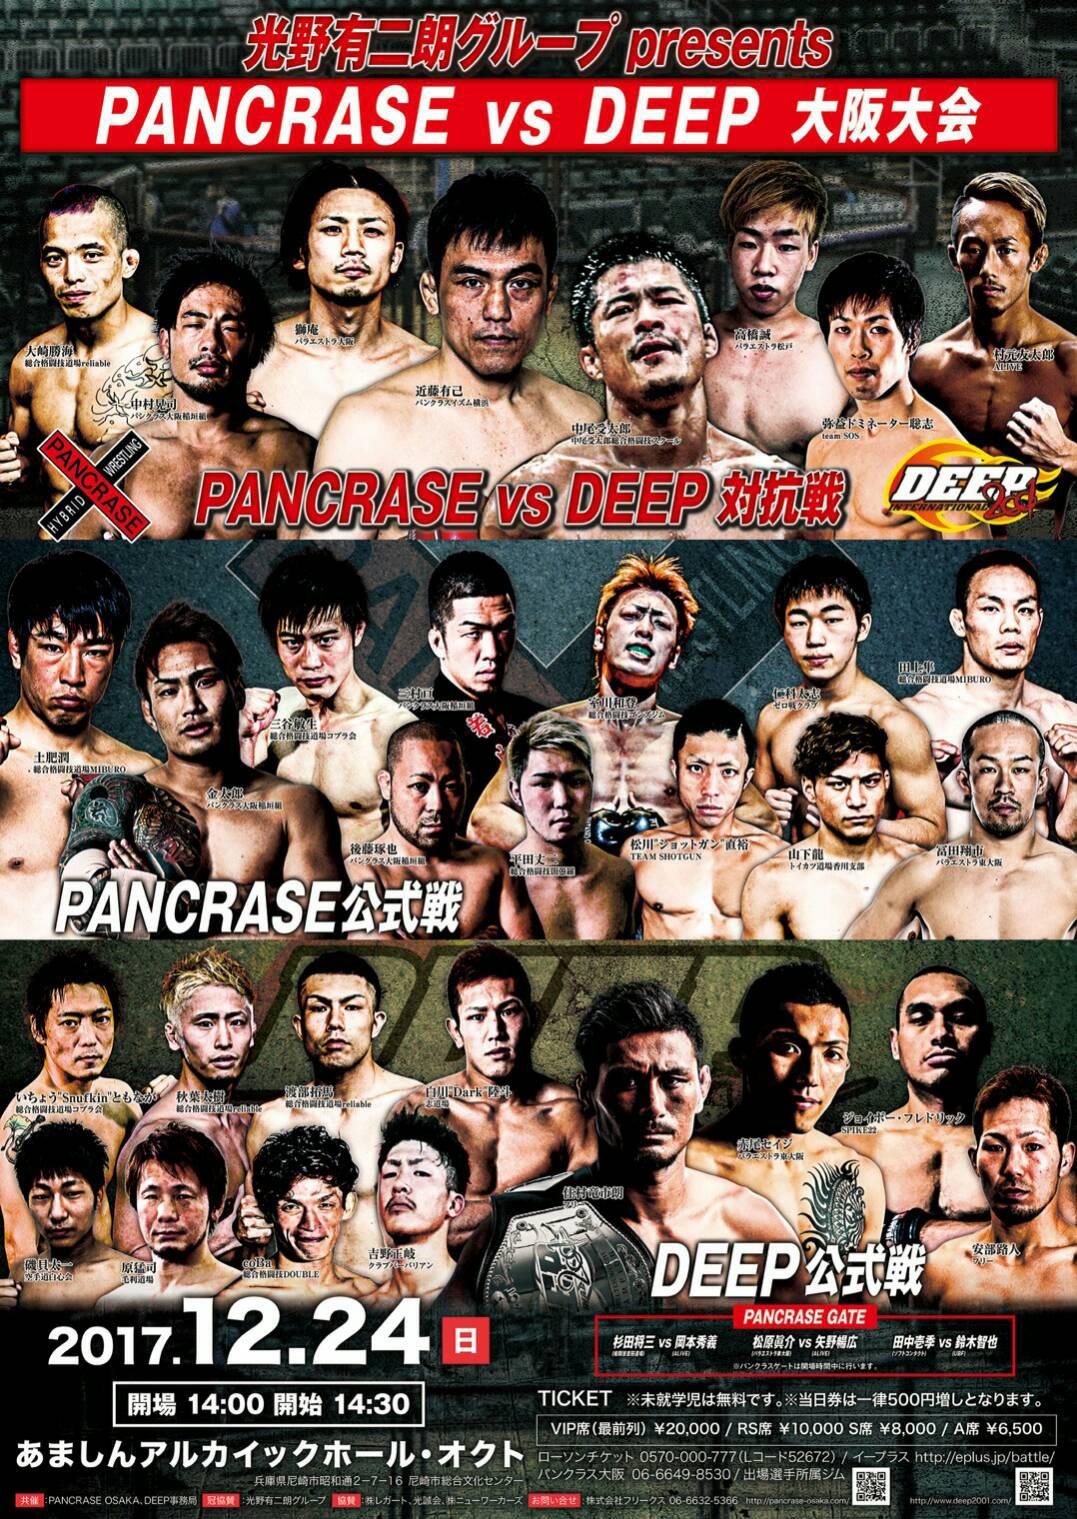 DEEP VSパンクラス 大阪大会2017ポスター画像最終.jpg